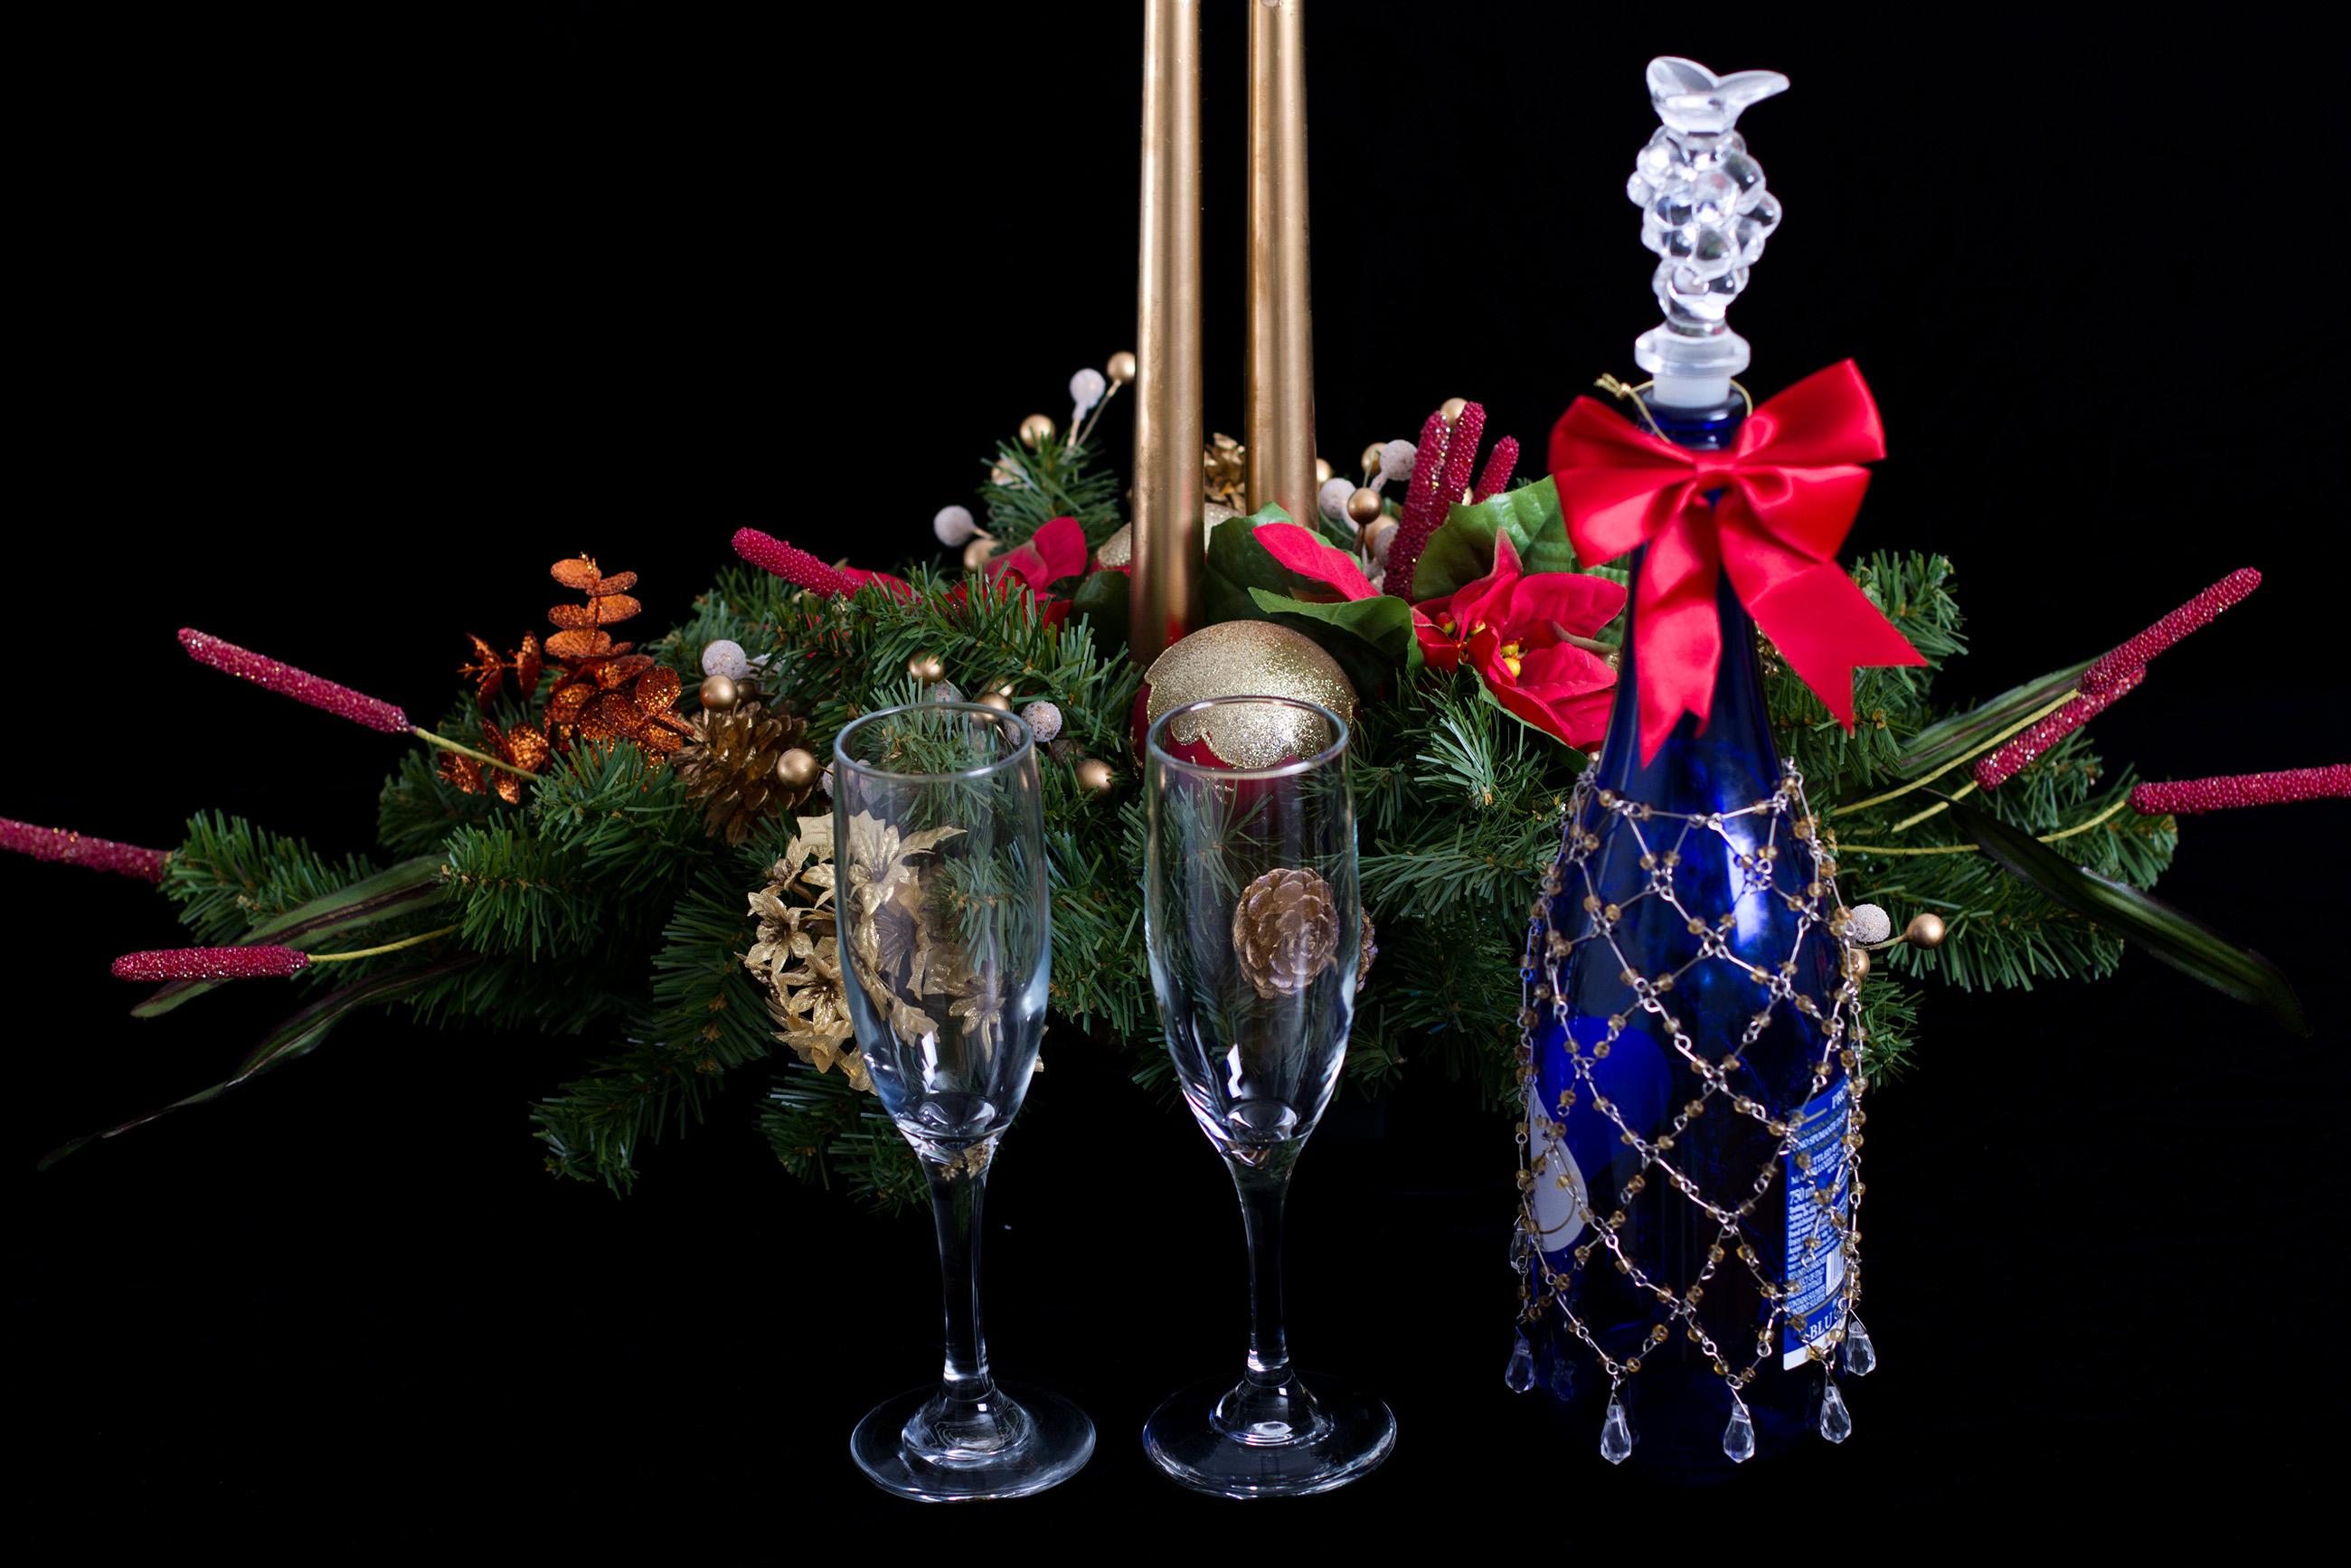 Christmas Holiday, Alcohol, Imagery, Wineglass, Wine, HQ Photo